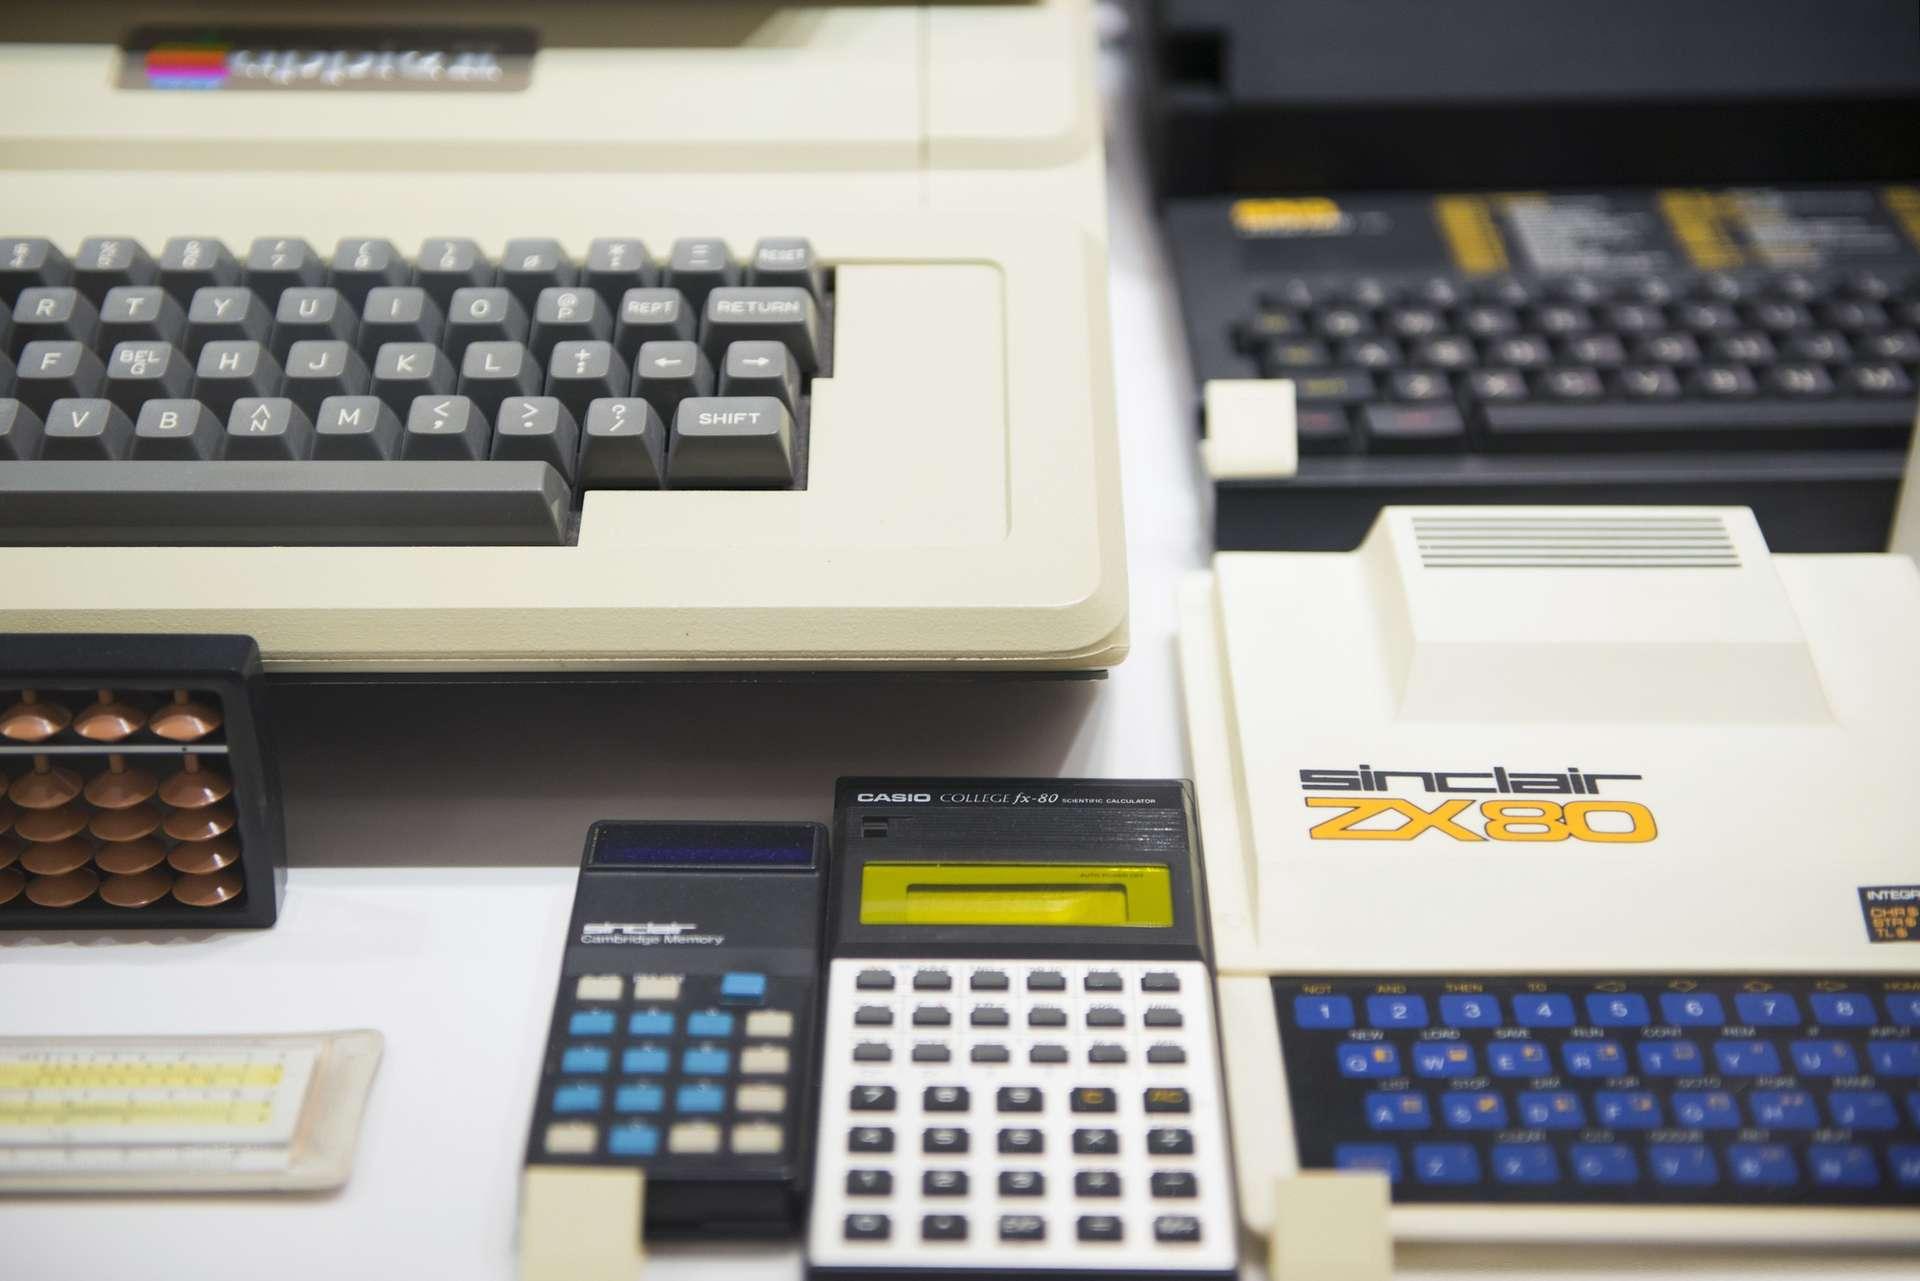 Various calculators and keyboards